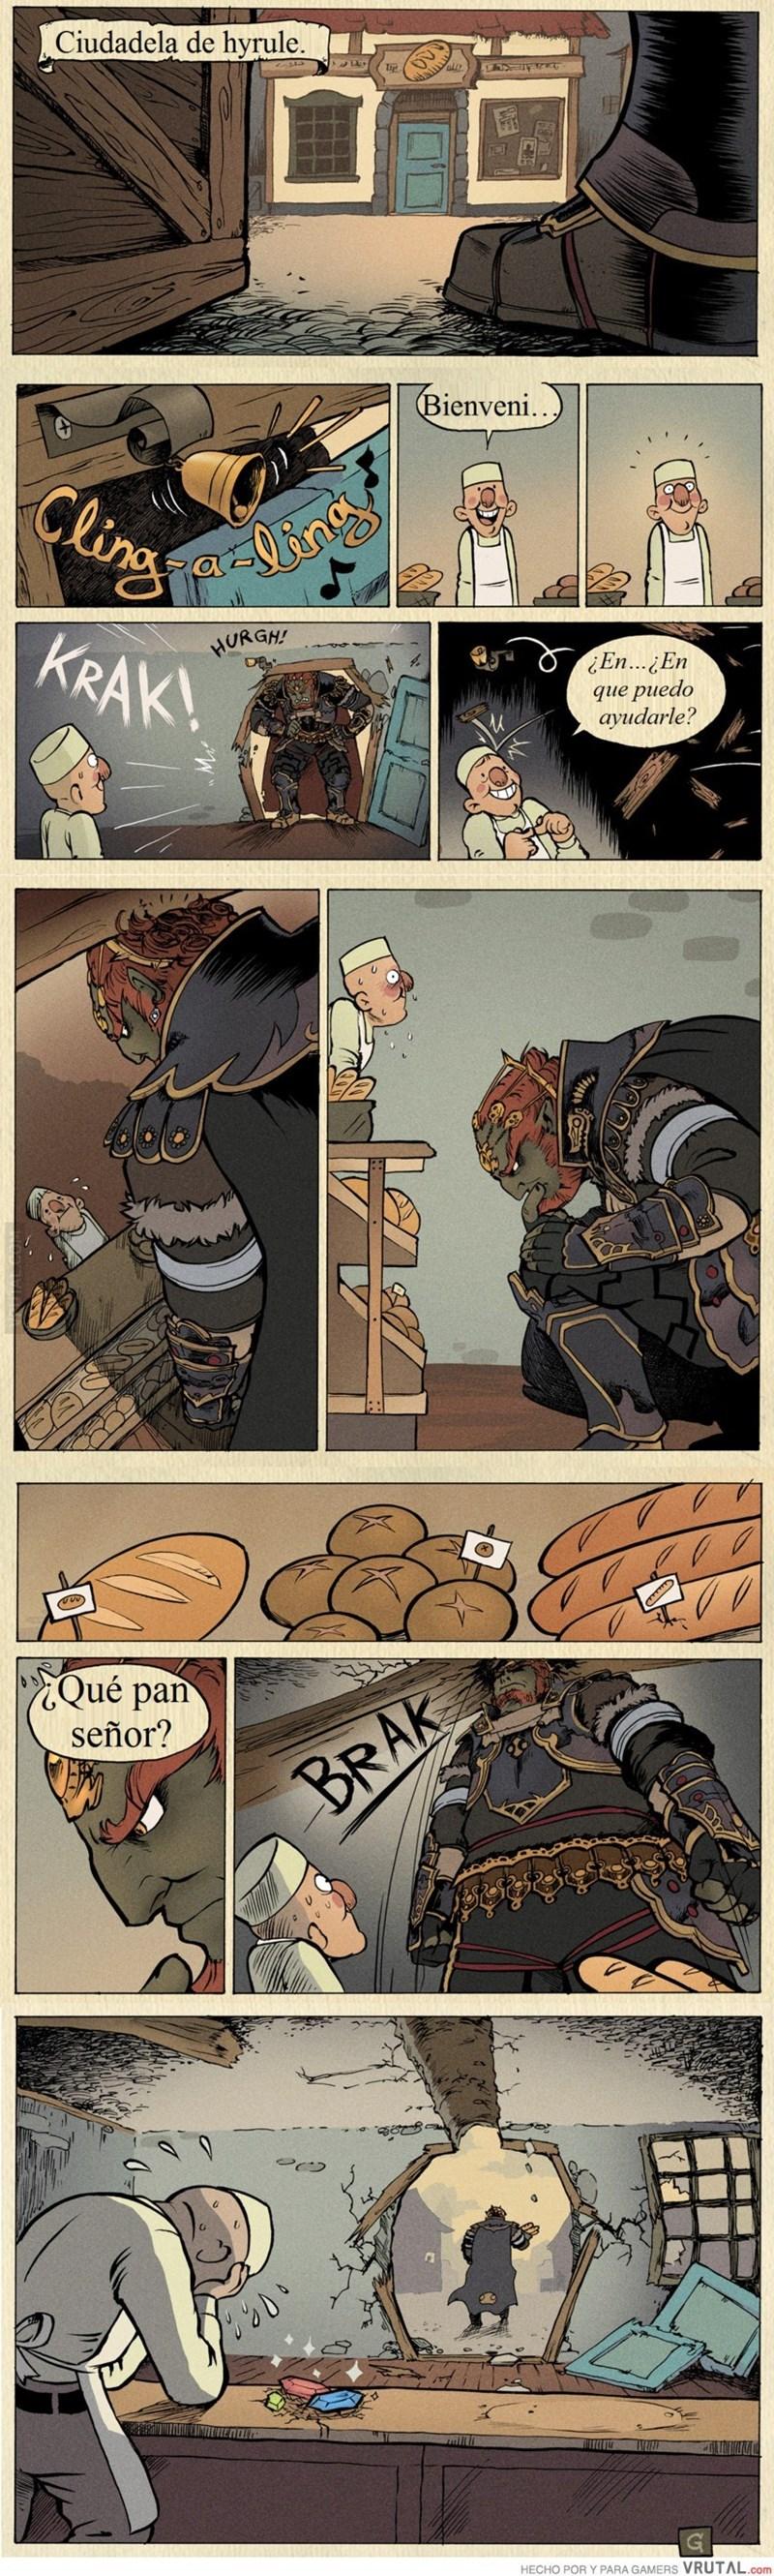 quiere pan